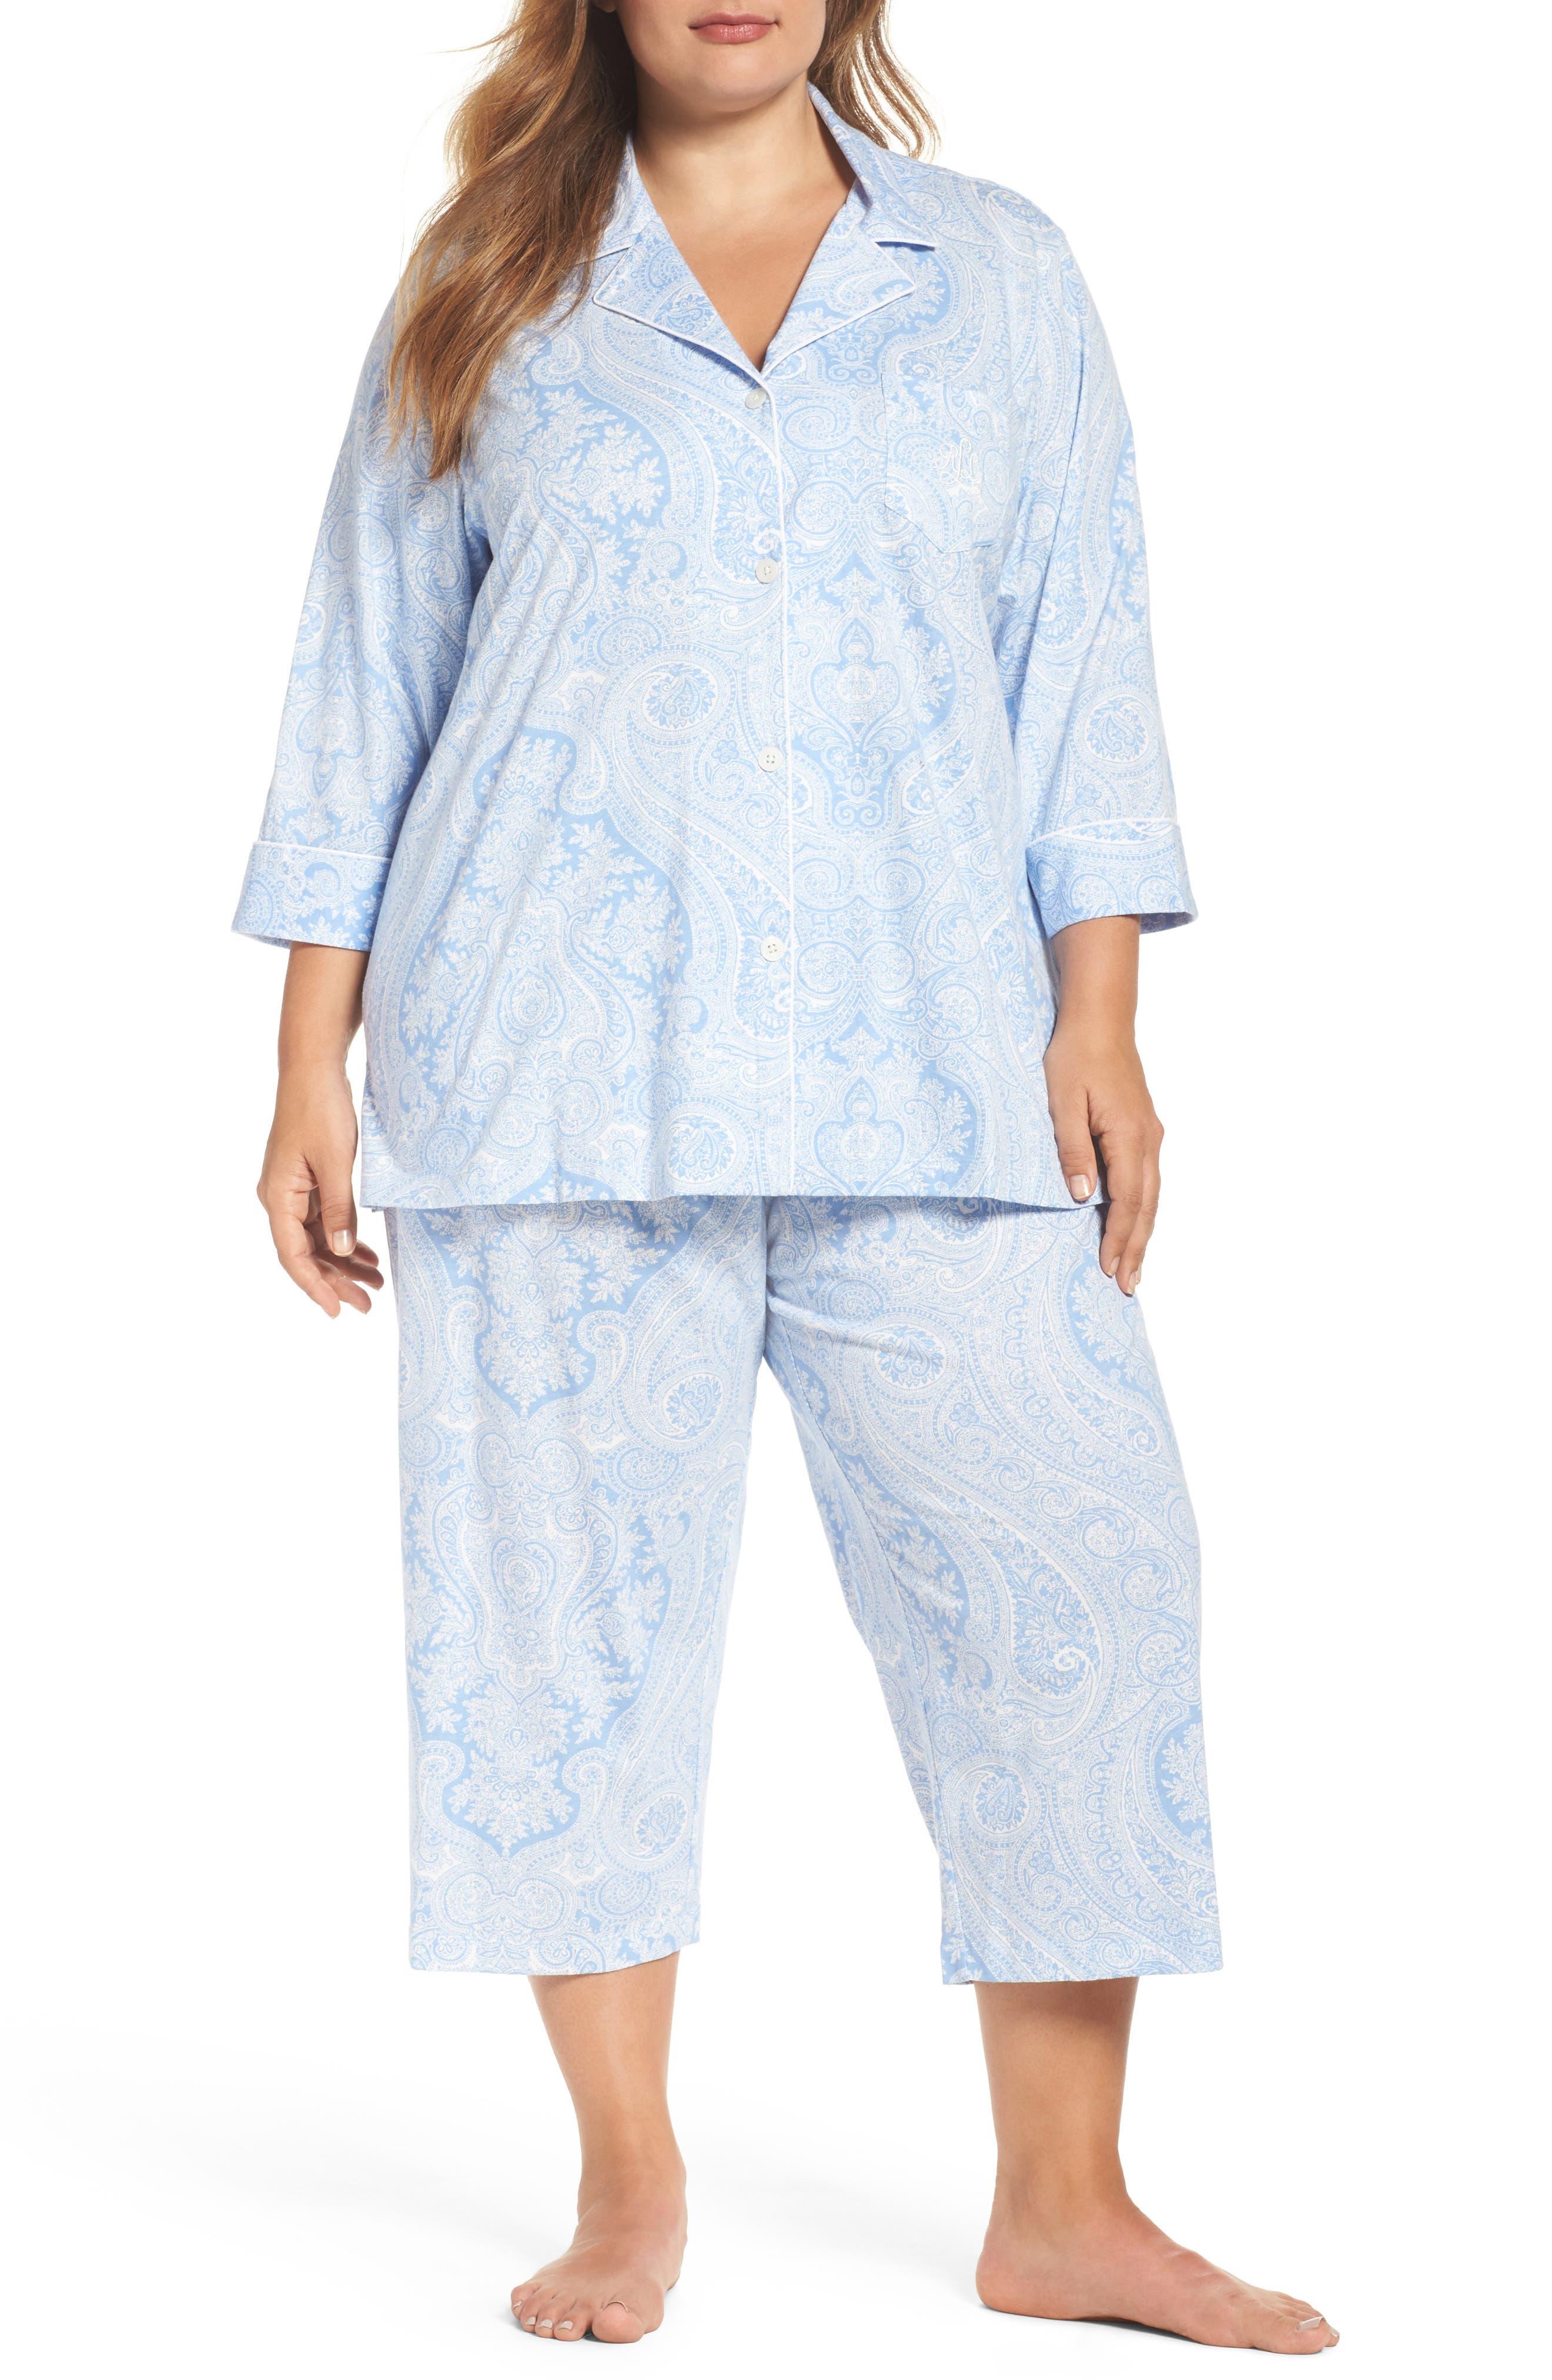 Alternate Image 1 Selected - Lauren Ralph Lauren Knit Crop Pajamas (Plus Size) (Online Only)